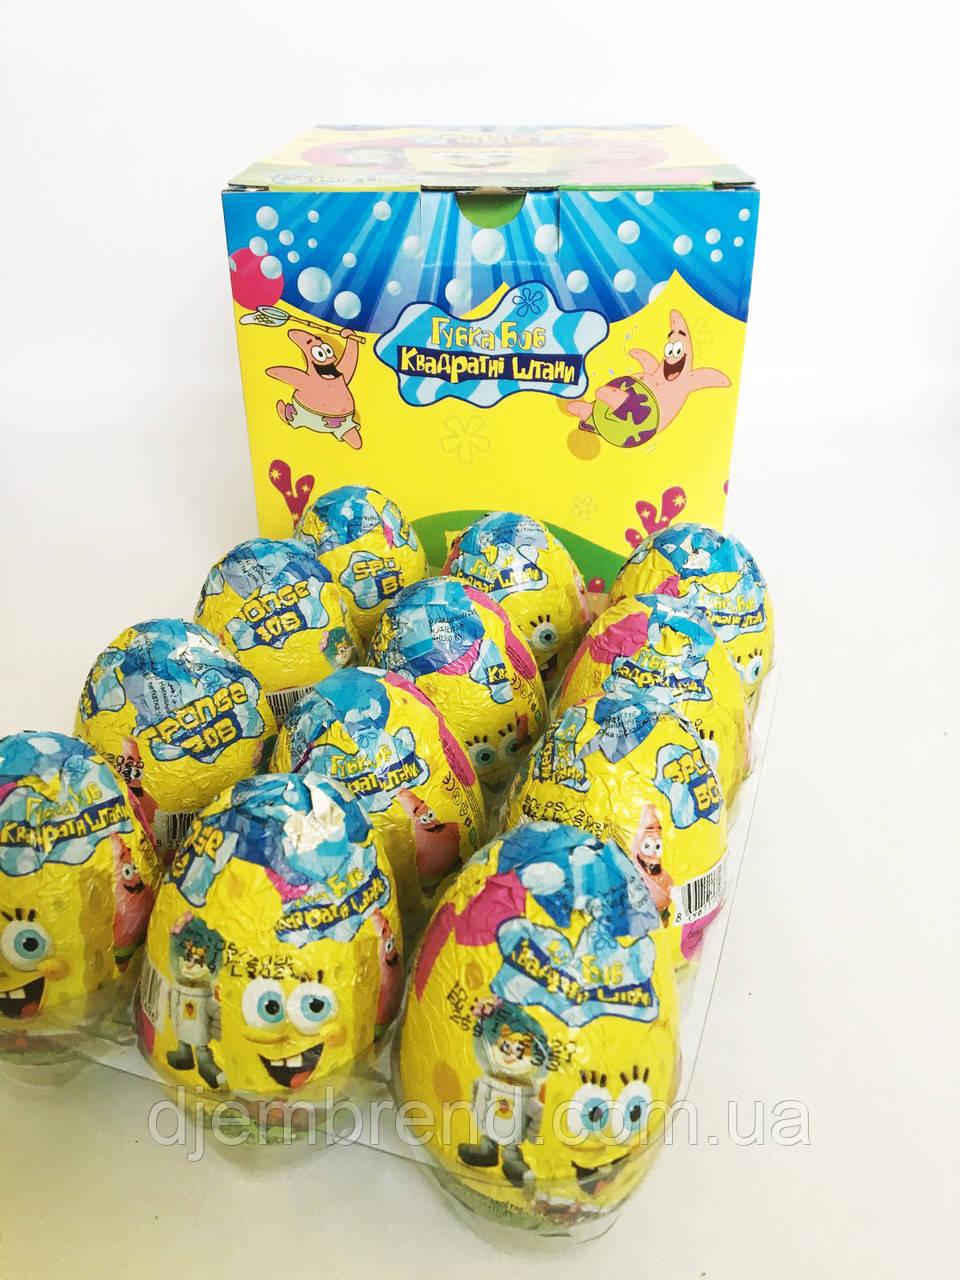 Яйцо шоколадное Спанч Боб 25 г 24 шт (ANL) Турция